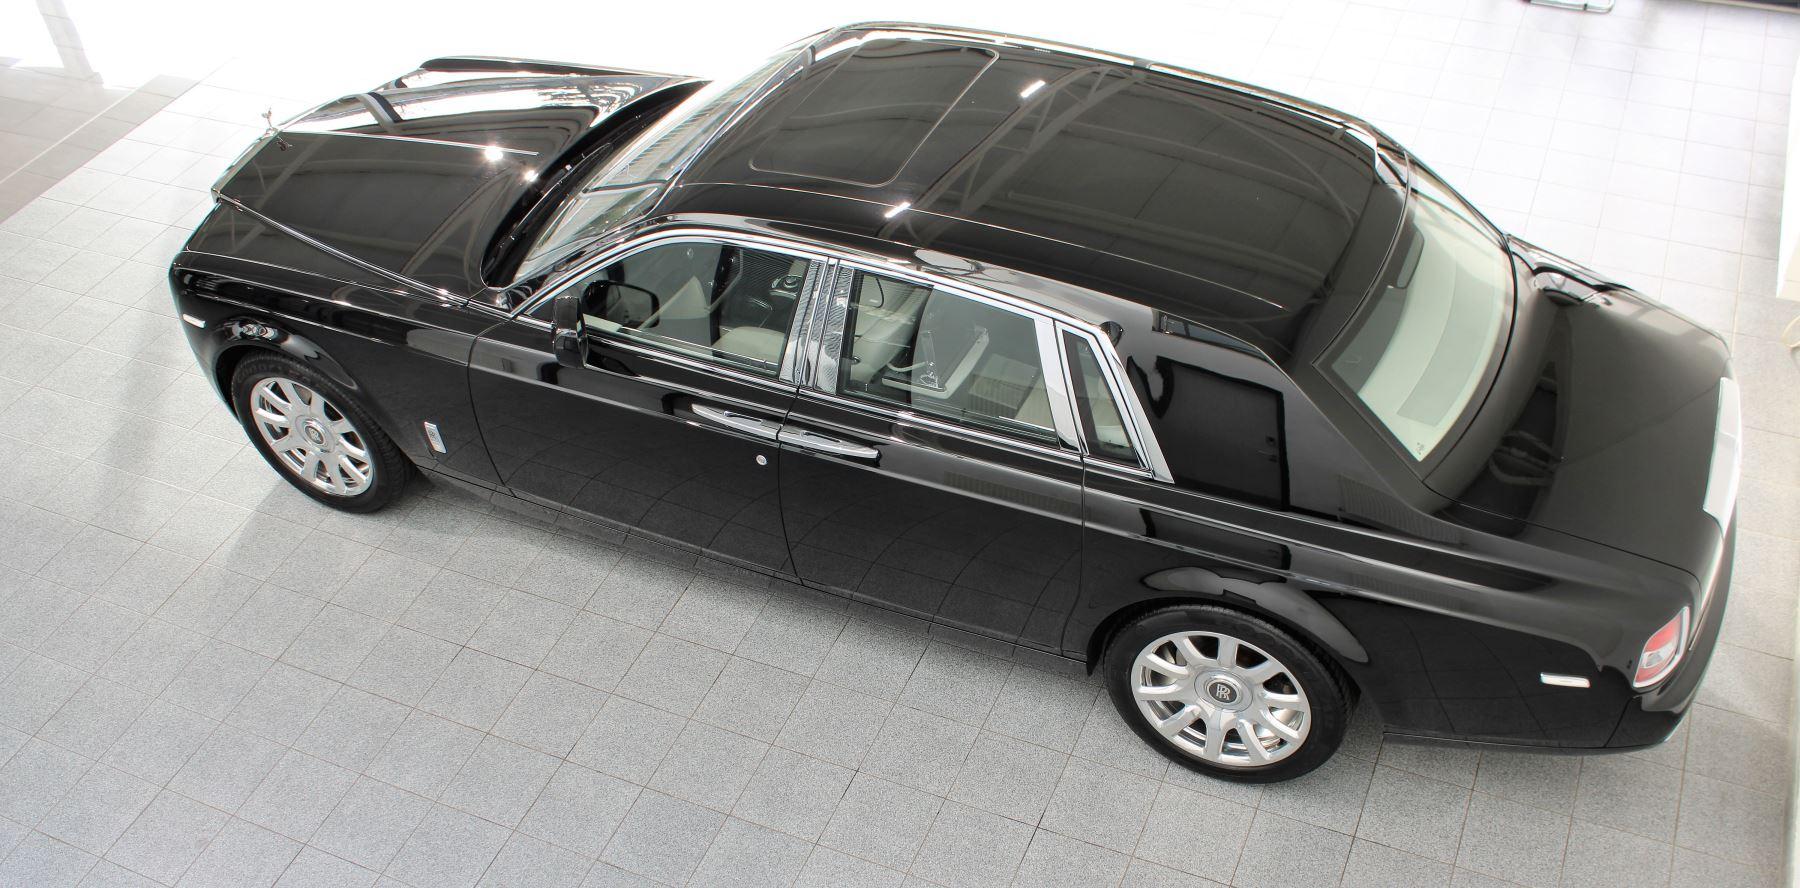 Rolls-Royce Phantom II 4dr Auto image 42